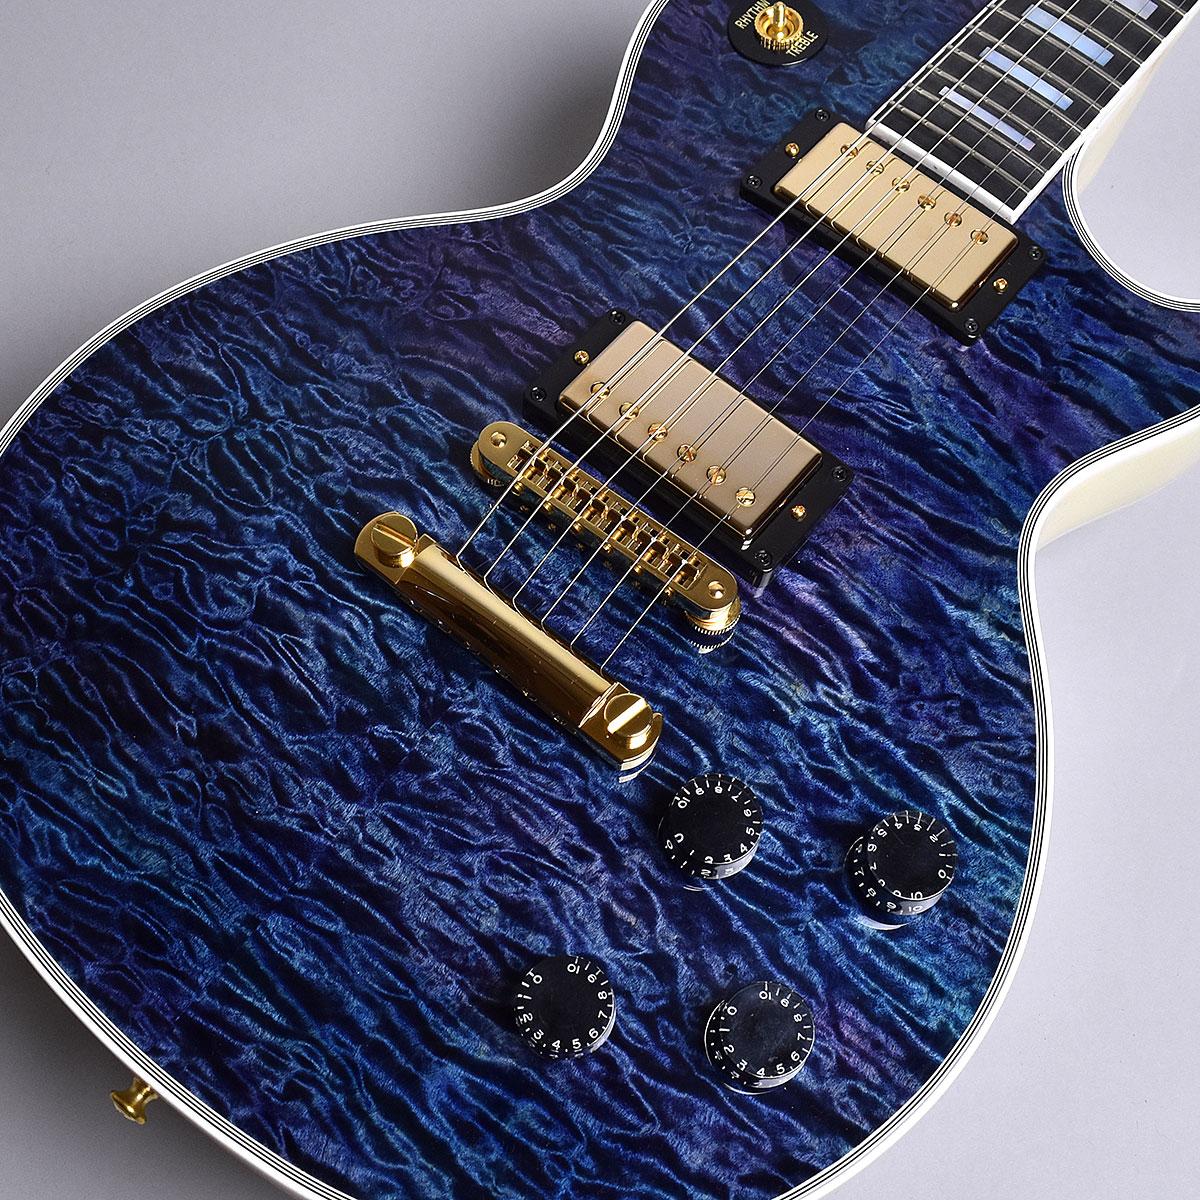 Gibson Custom Shop Hand Picked Limited Les Paul Custom 5A Quilt / Nordic Blue S/N:CS800123 レスポールカスタム 【ギブソン カスタムショップ】【現地選定品】